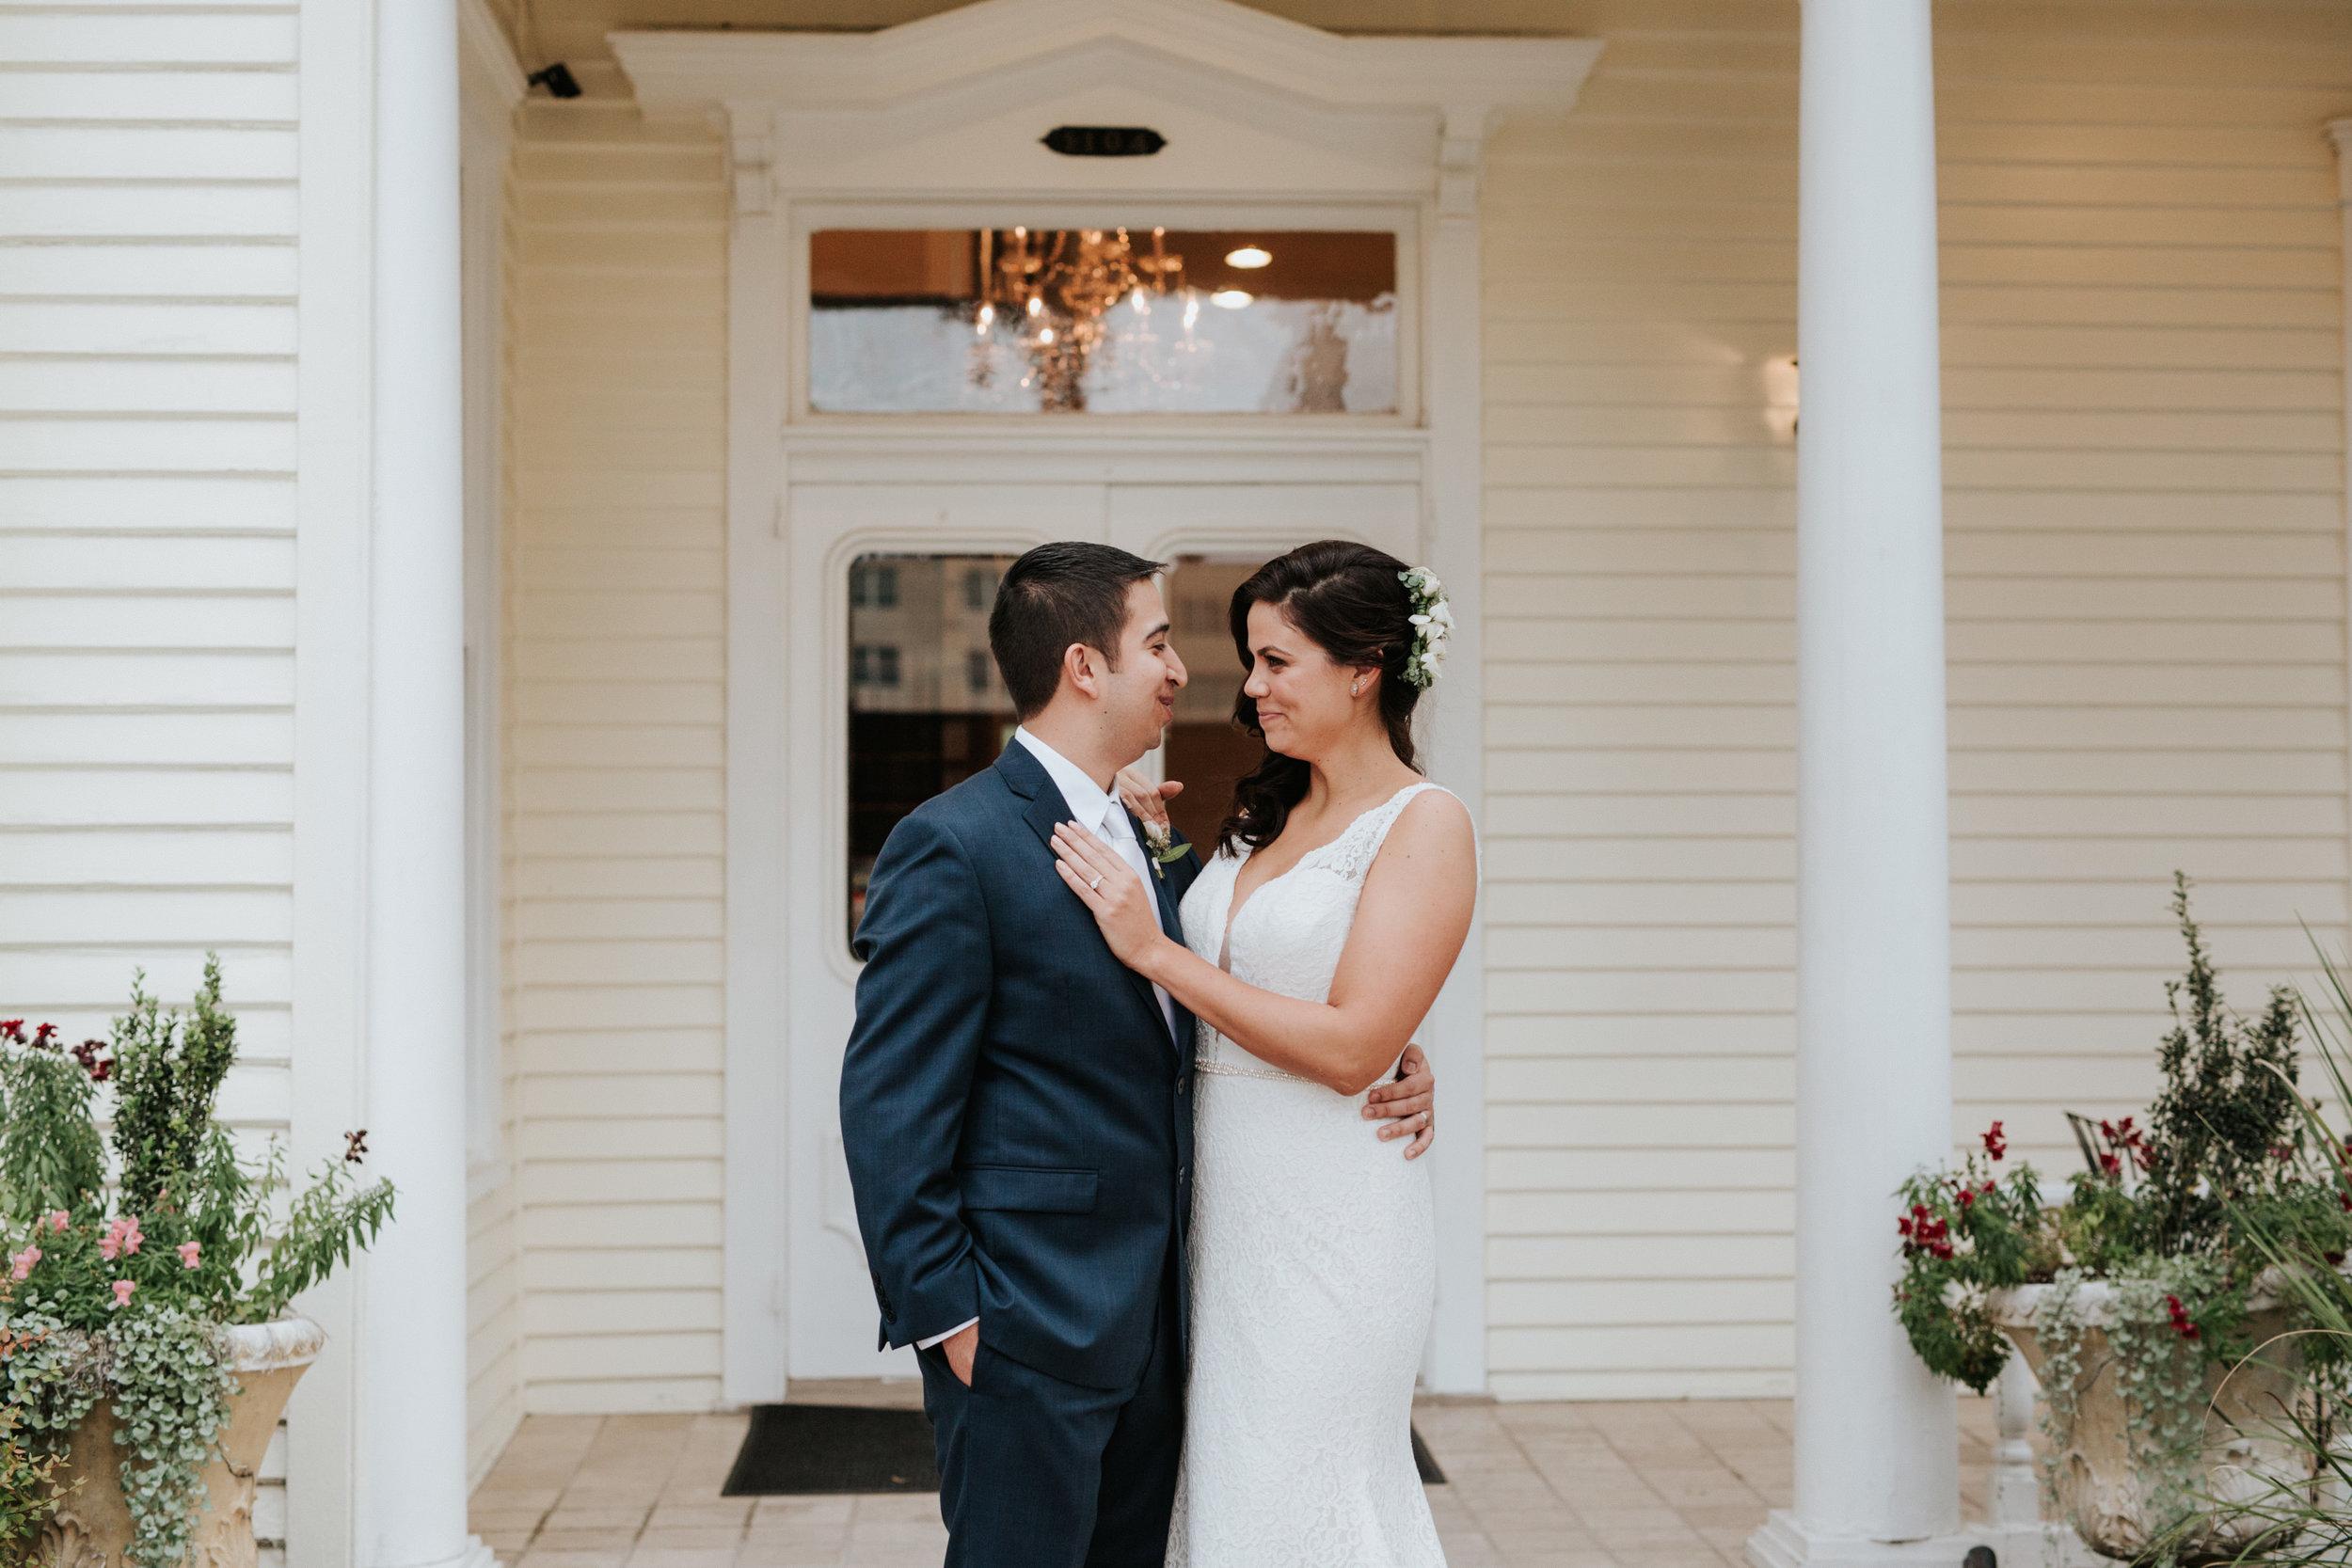 Ginny + Mando Wedding - Diana Ascarrunz Photography-928.JPG